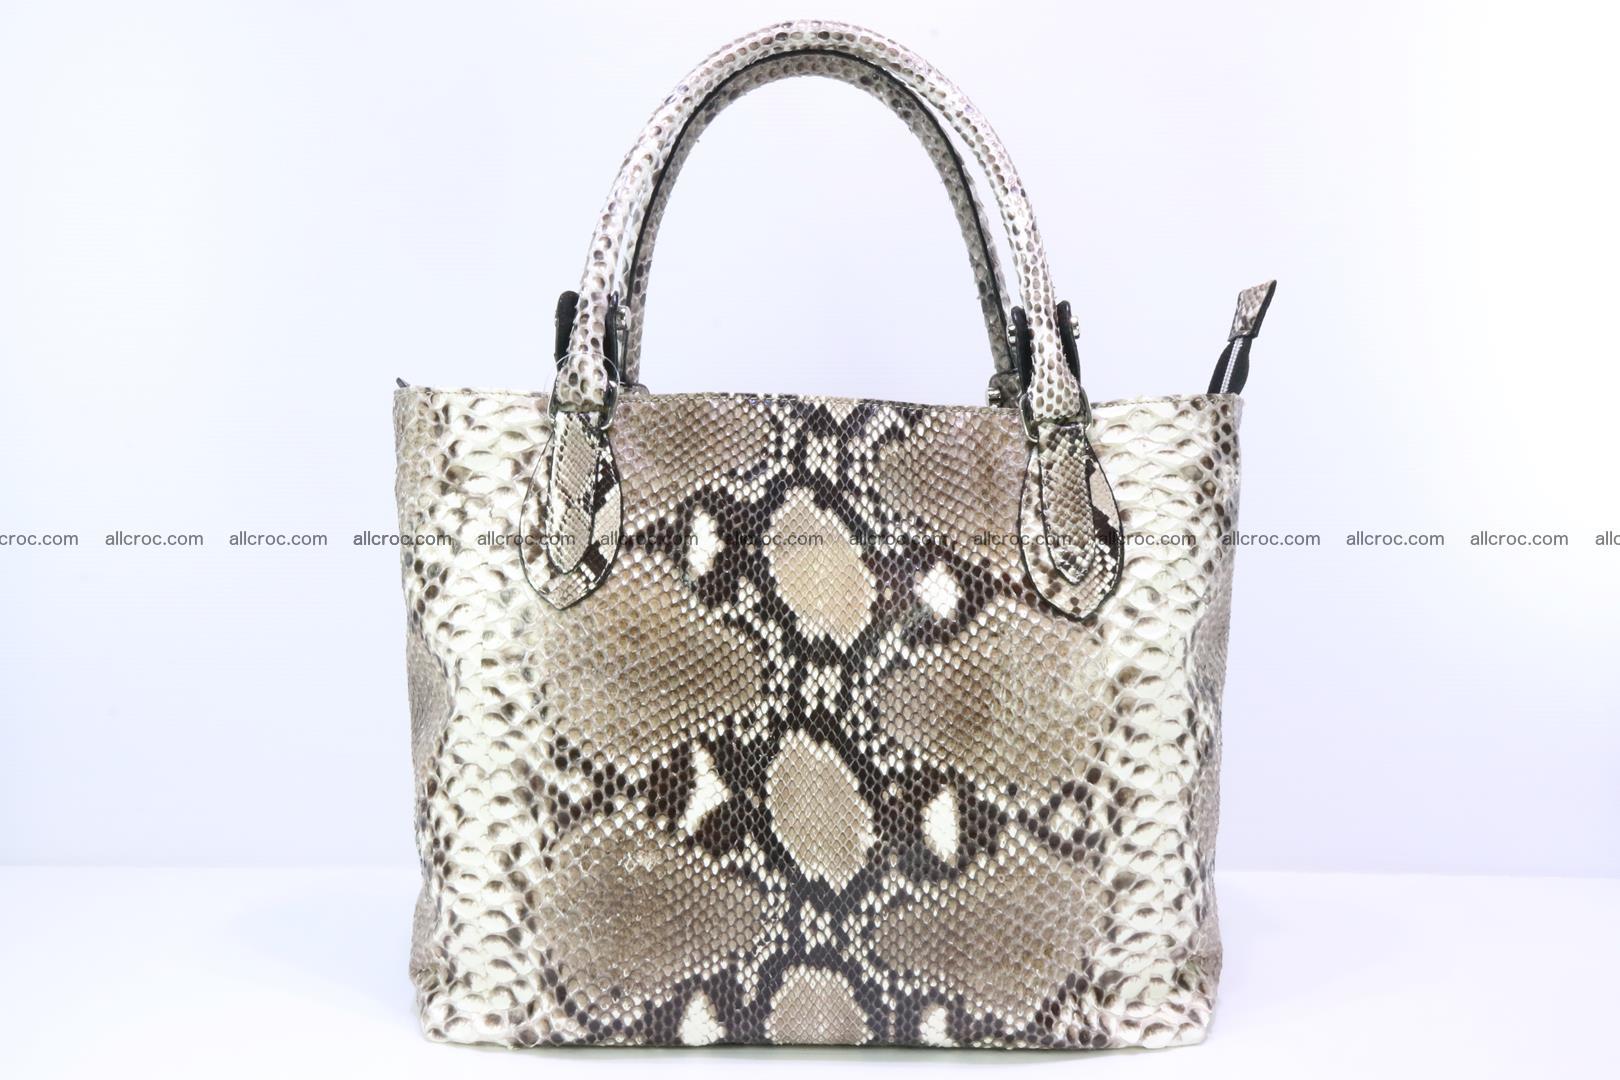 Python skin handbag for lady from genuine Python skin 206 Foto 0